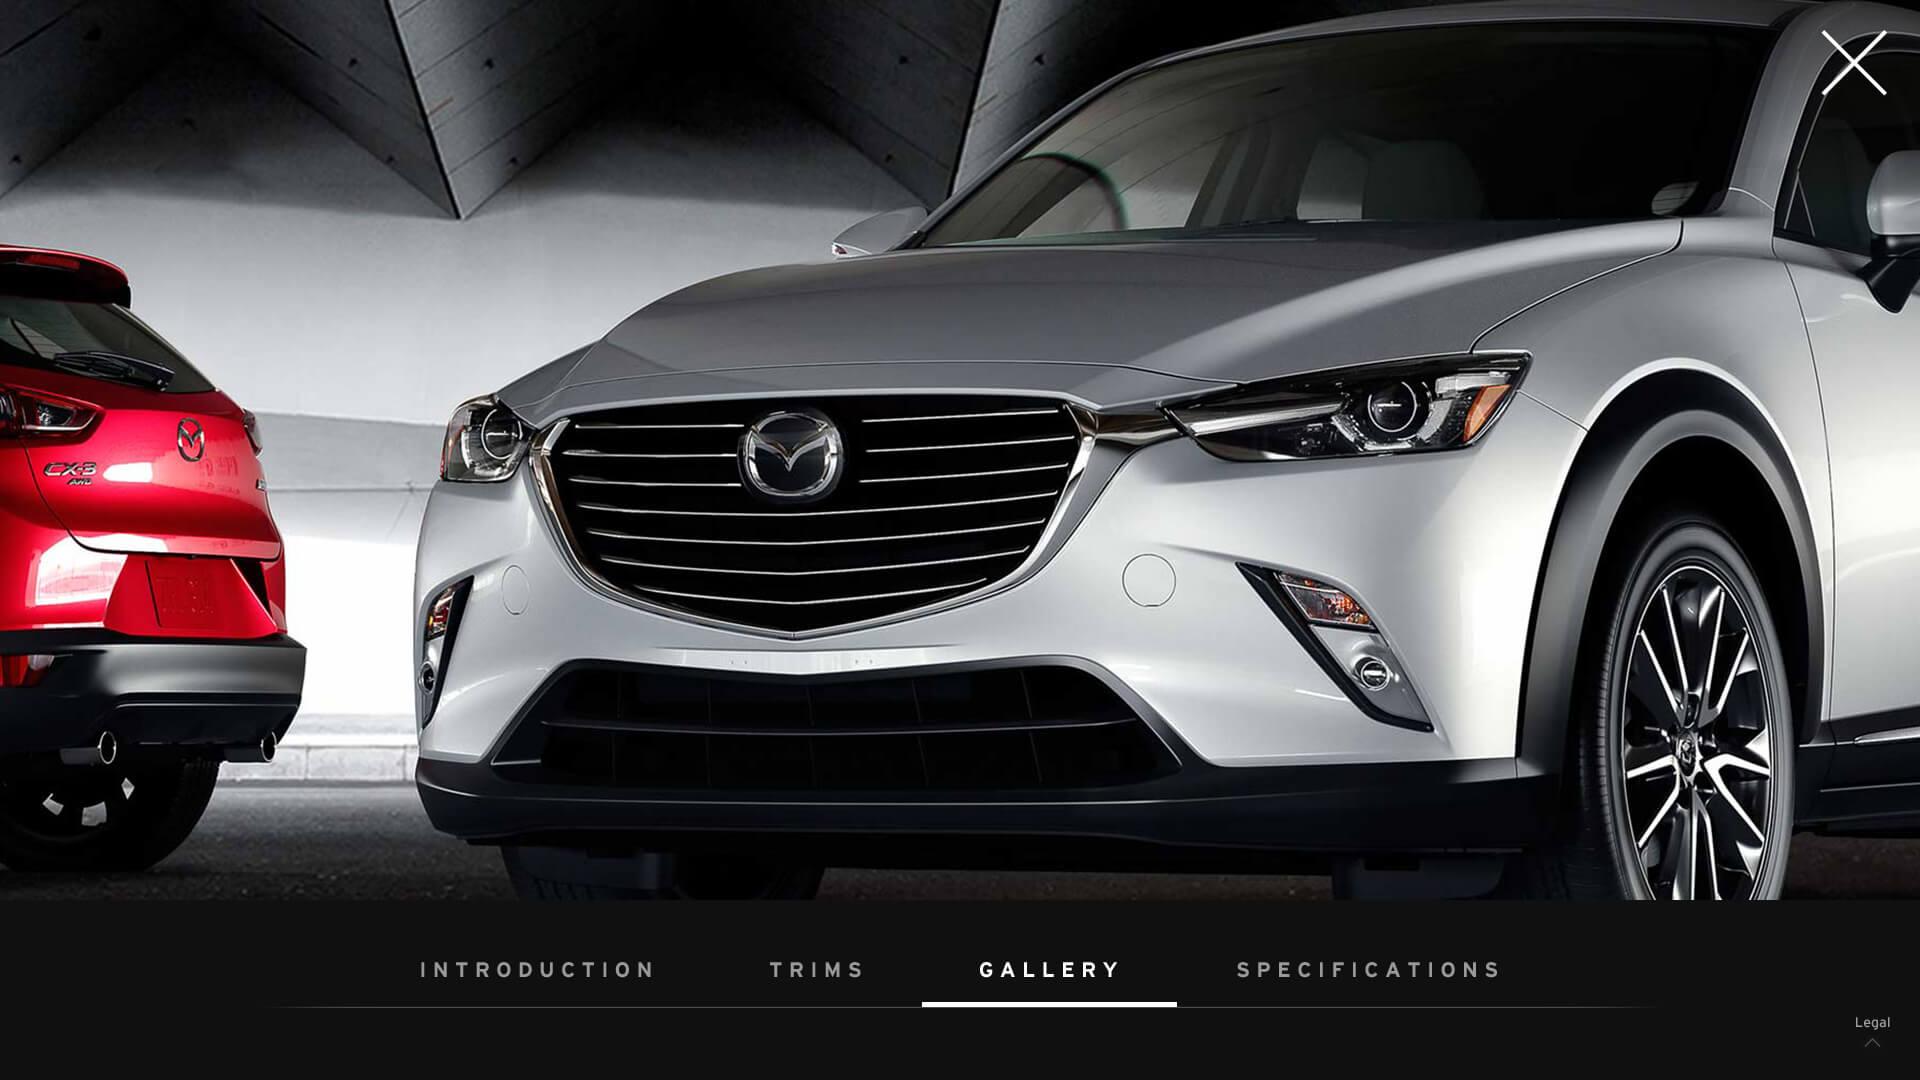 Mazda_wheelstand_2017_1920x1080_03_adjusted